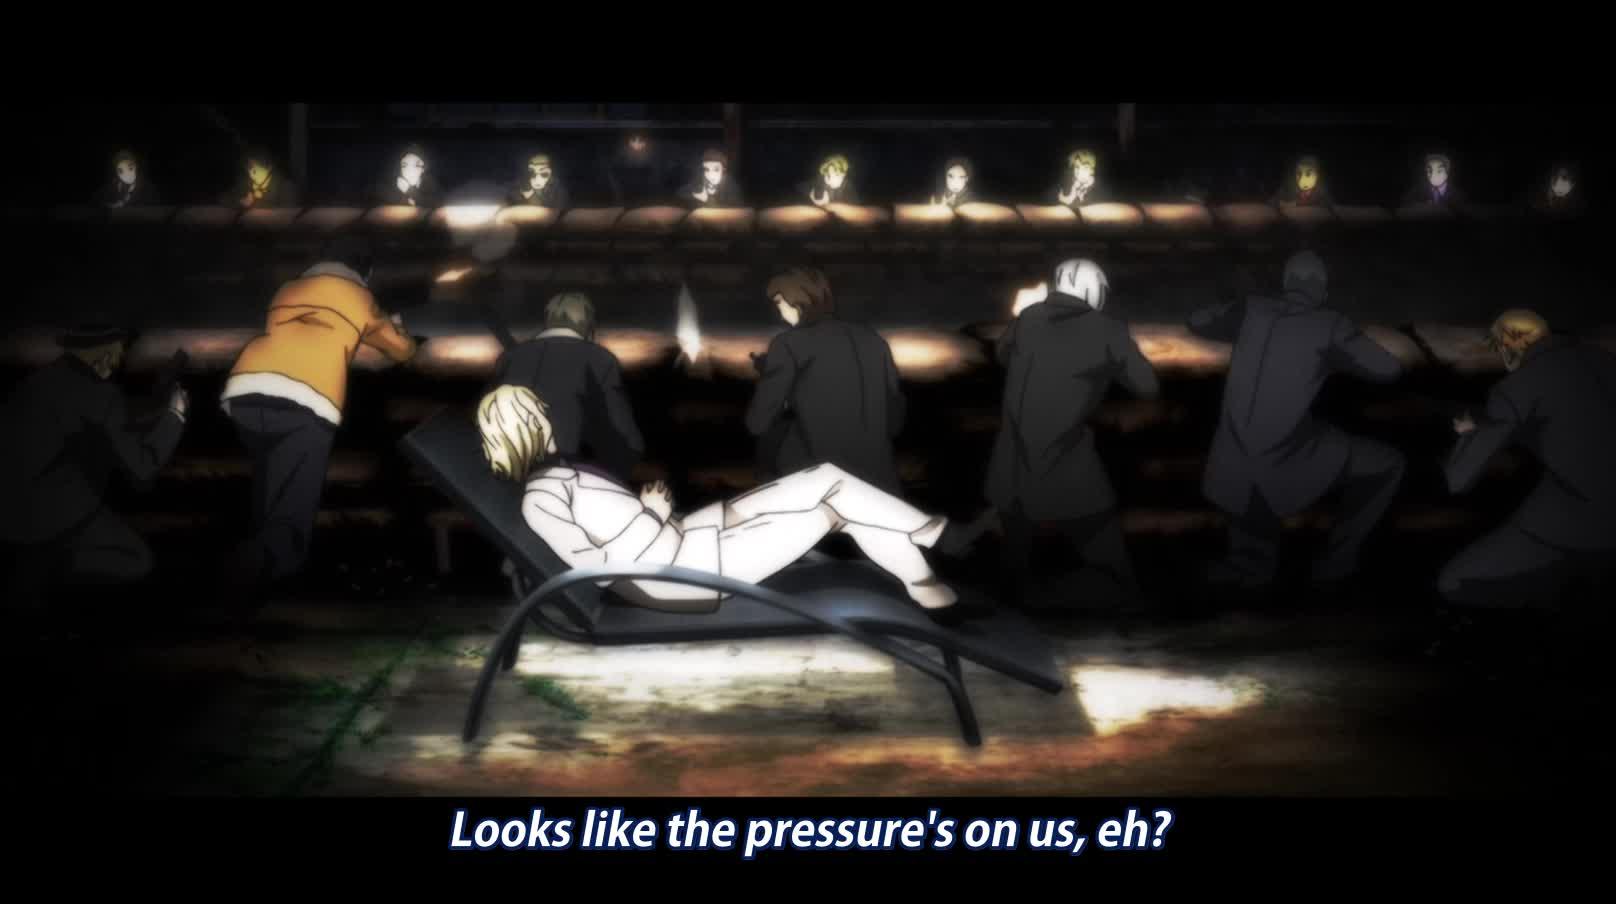 Nisekoi S02E12 (11) GIFs